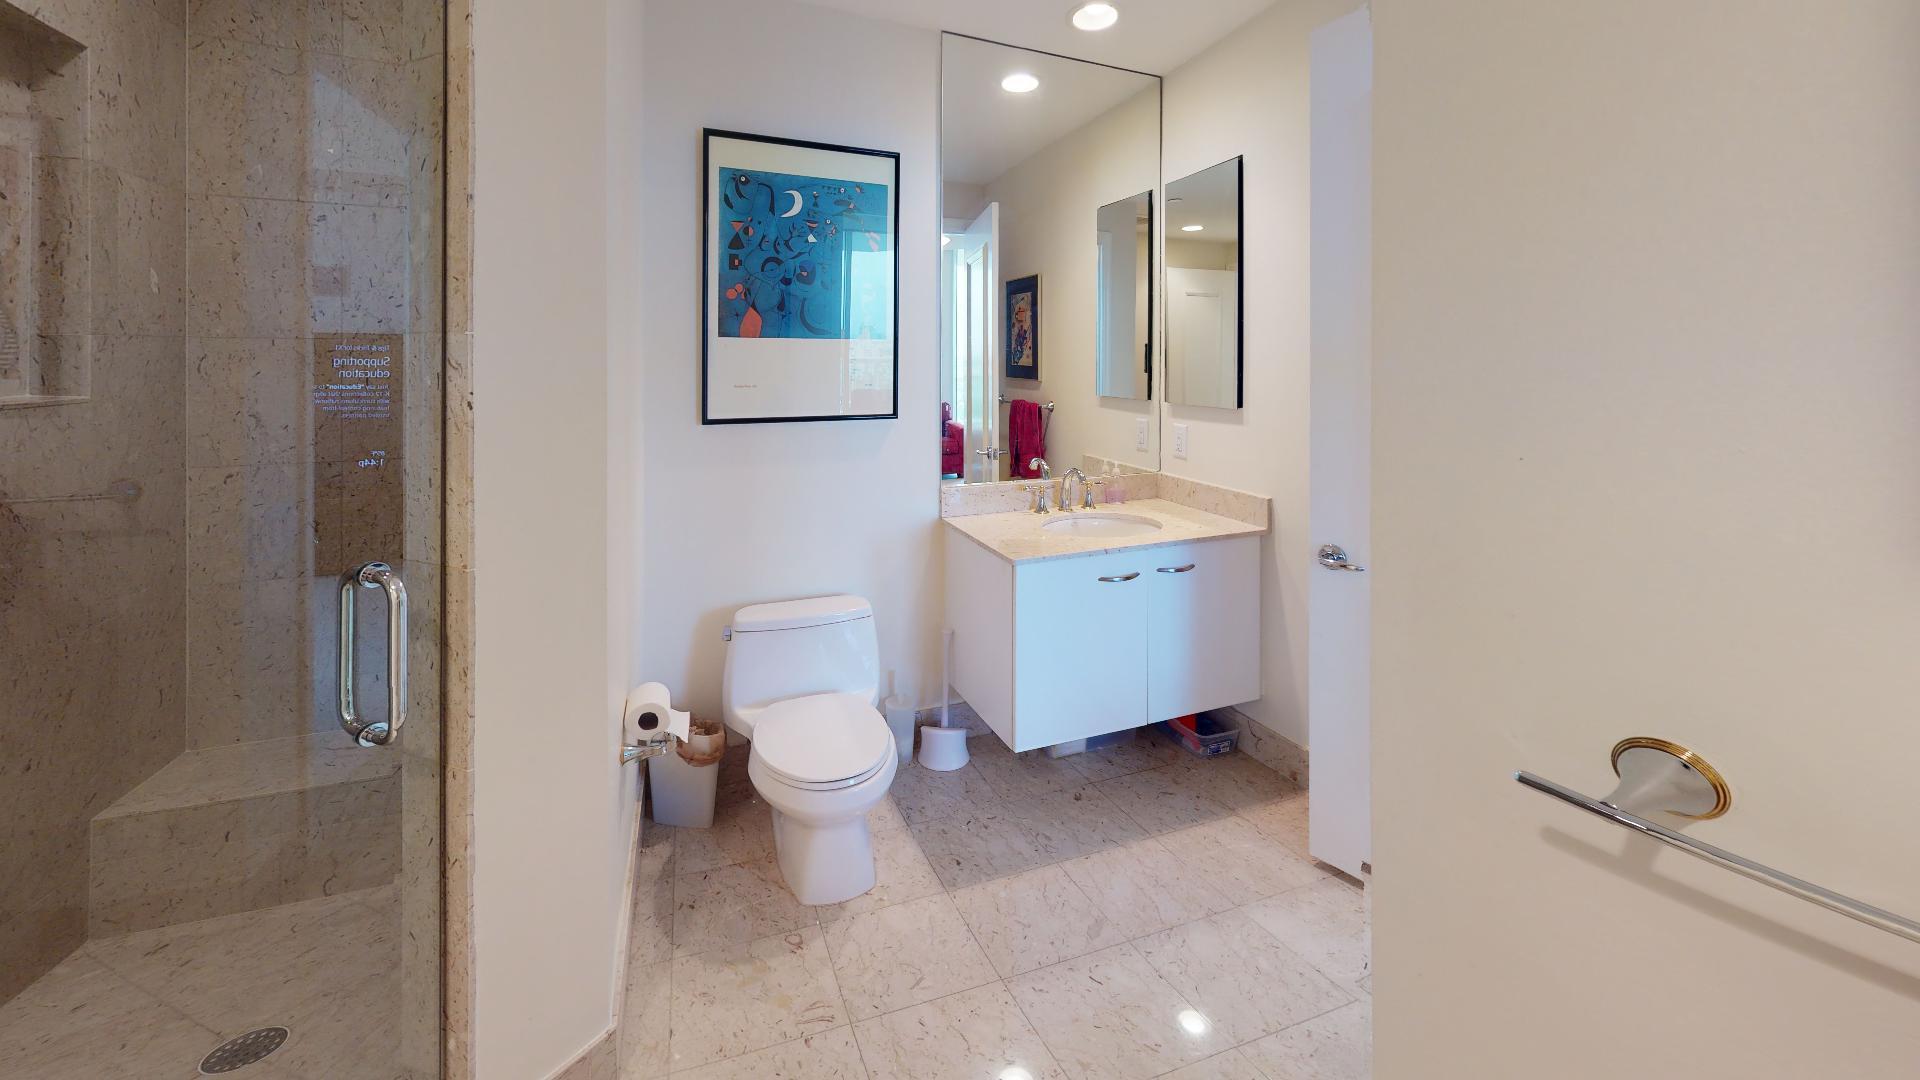 21200 Point Place, Aventura, Florida 33180, 5 Bedrooms Bedrooms, ,5.1 BathroomsBathrooms,Condo/Coop,For Sale,Point,23,RX-10688026